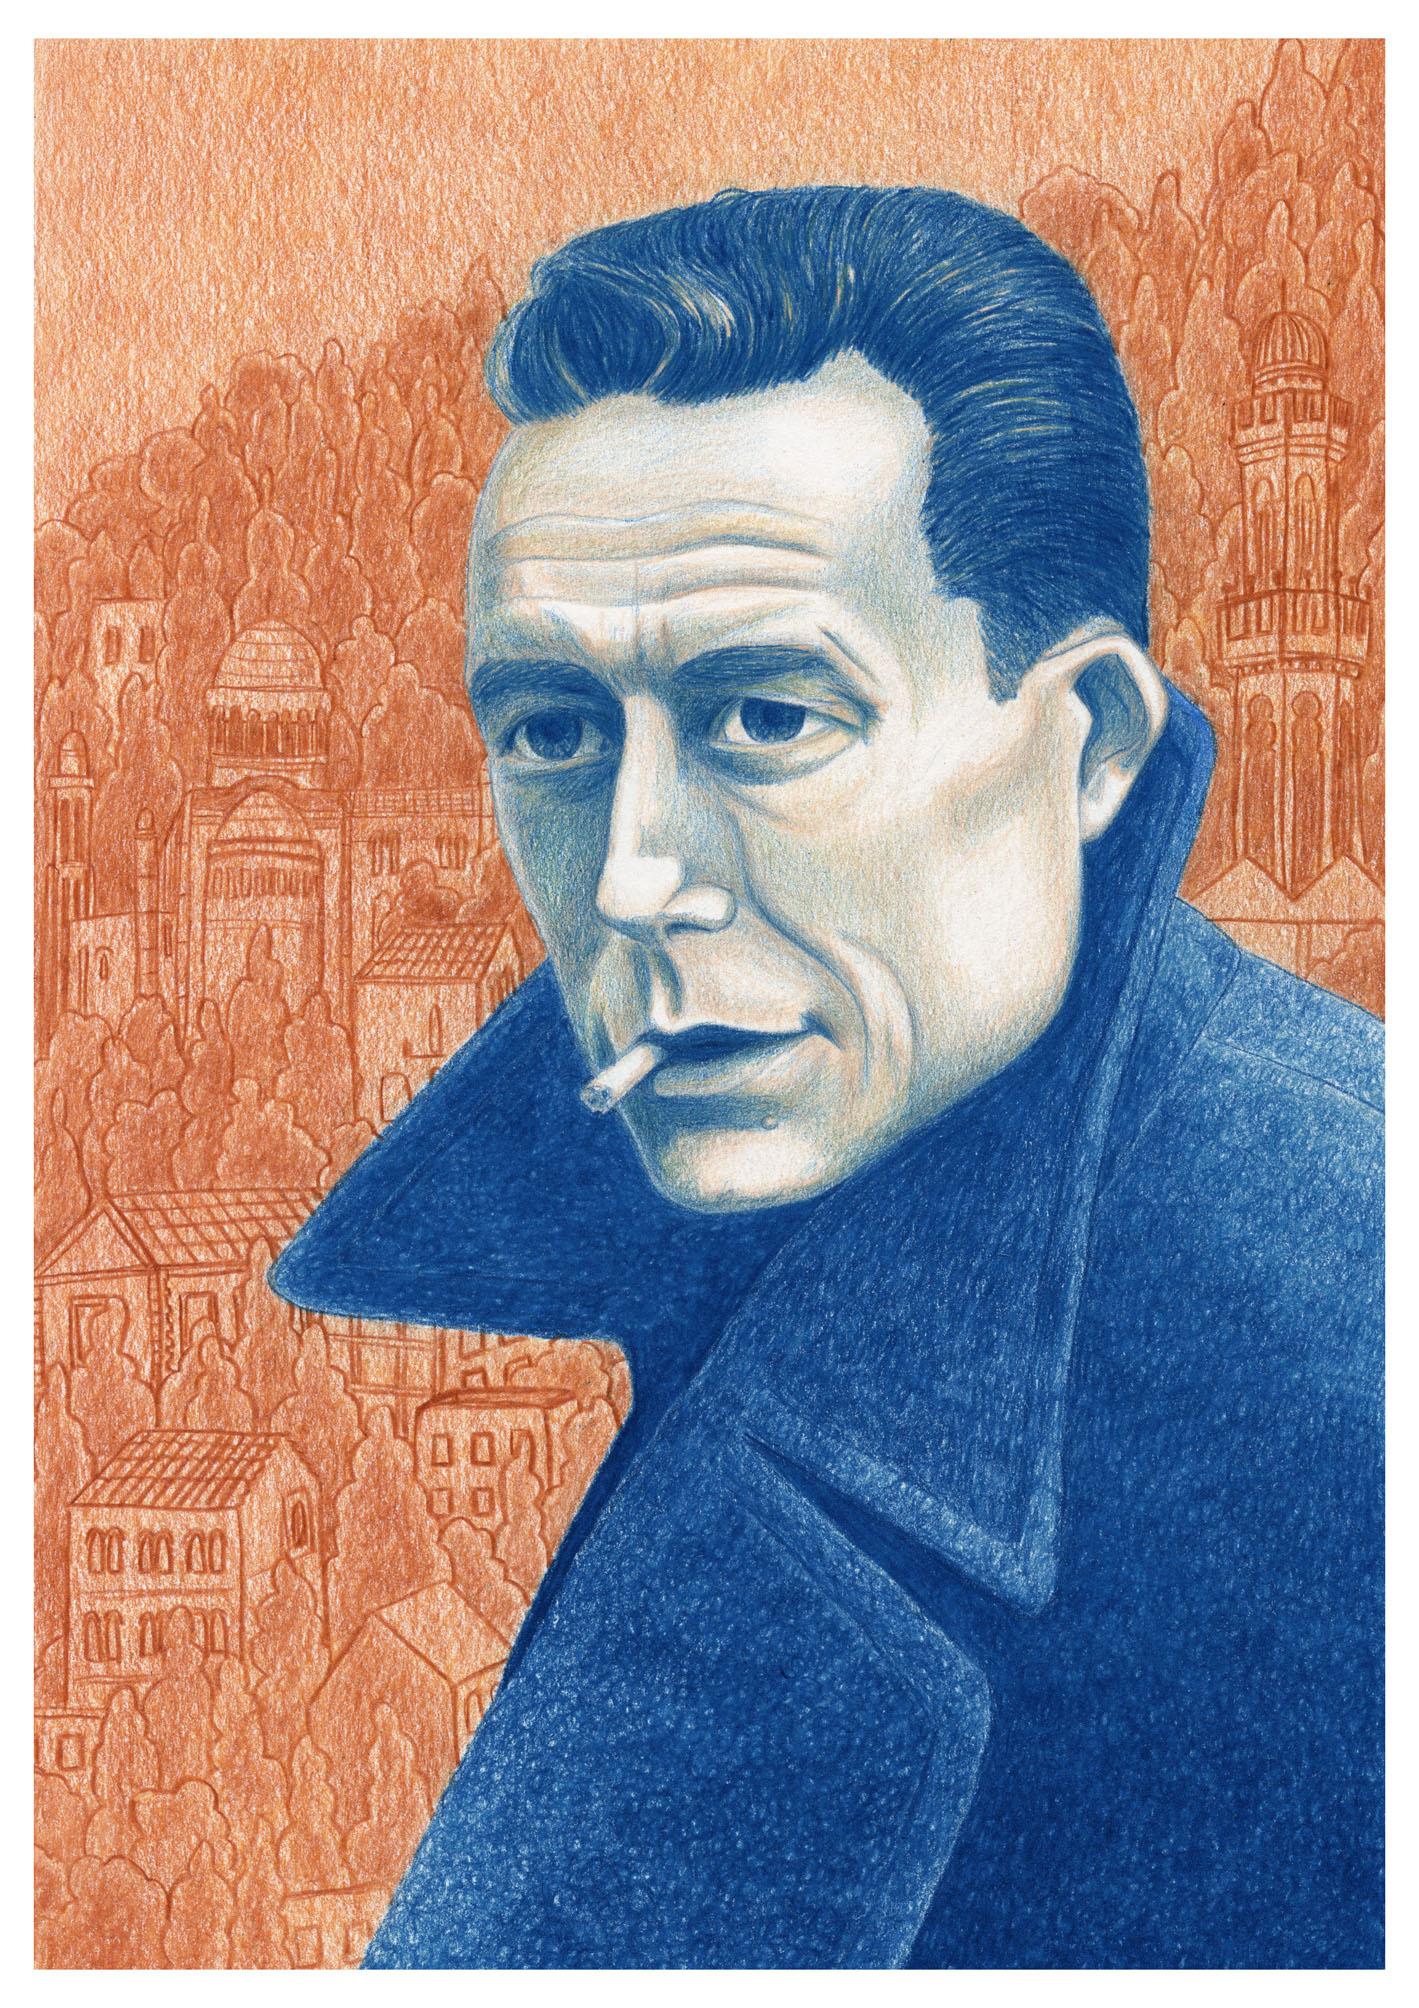 My finished illustration of Albert Camus